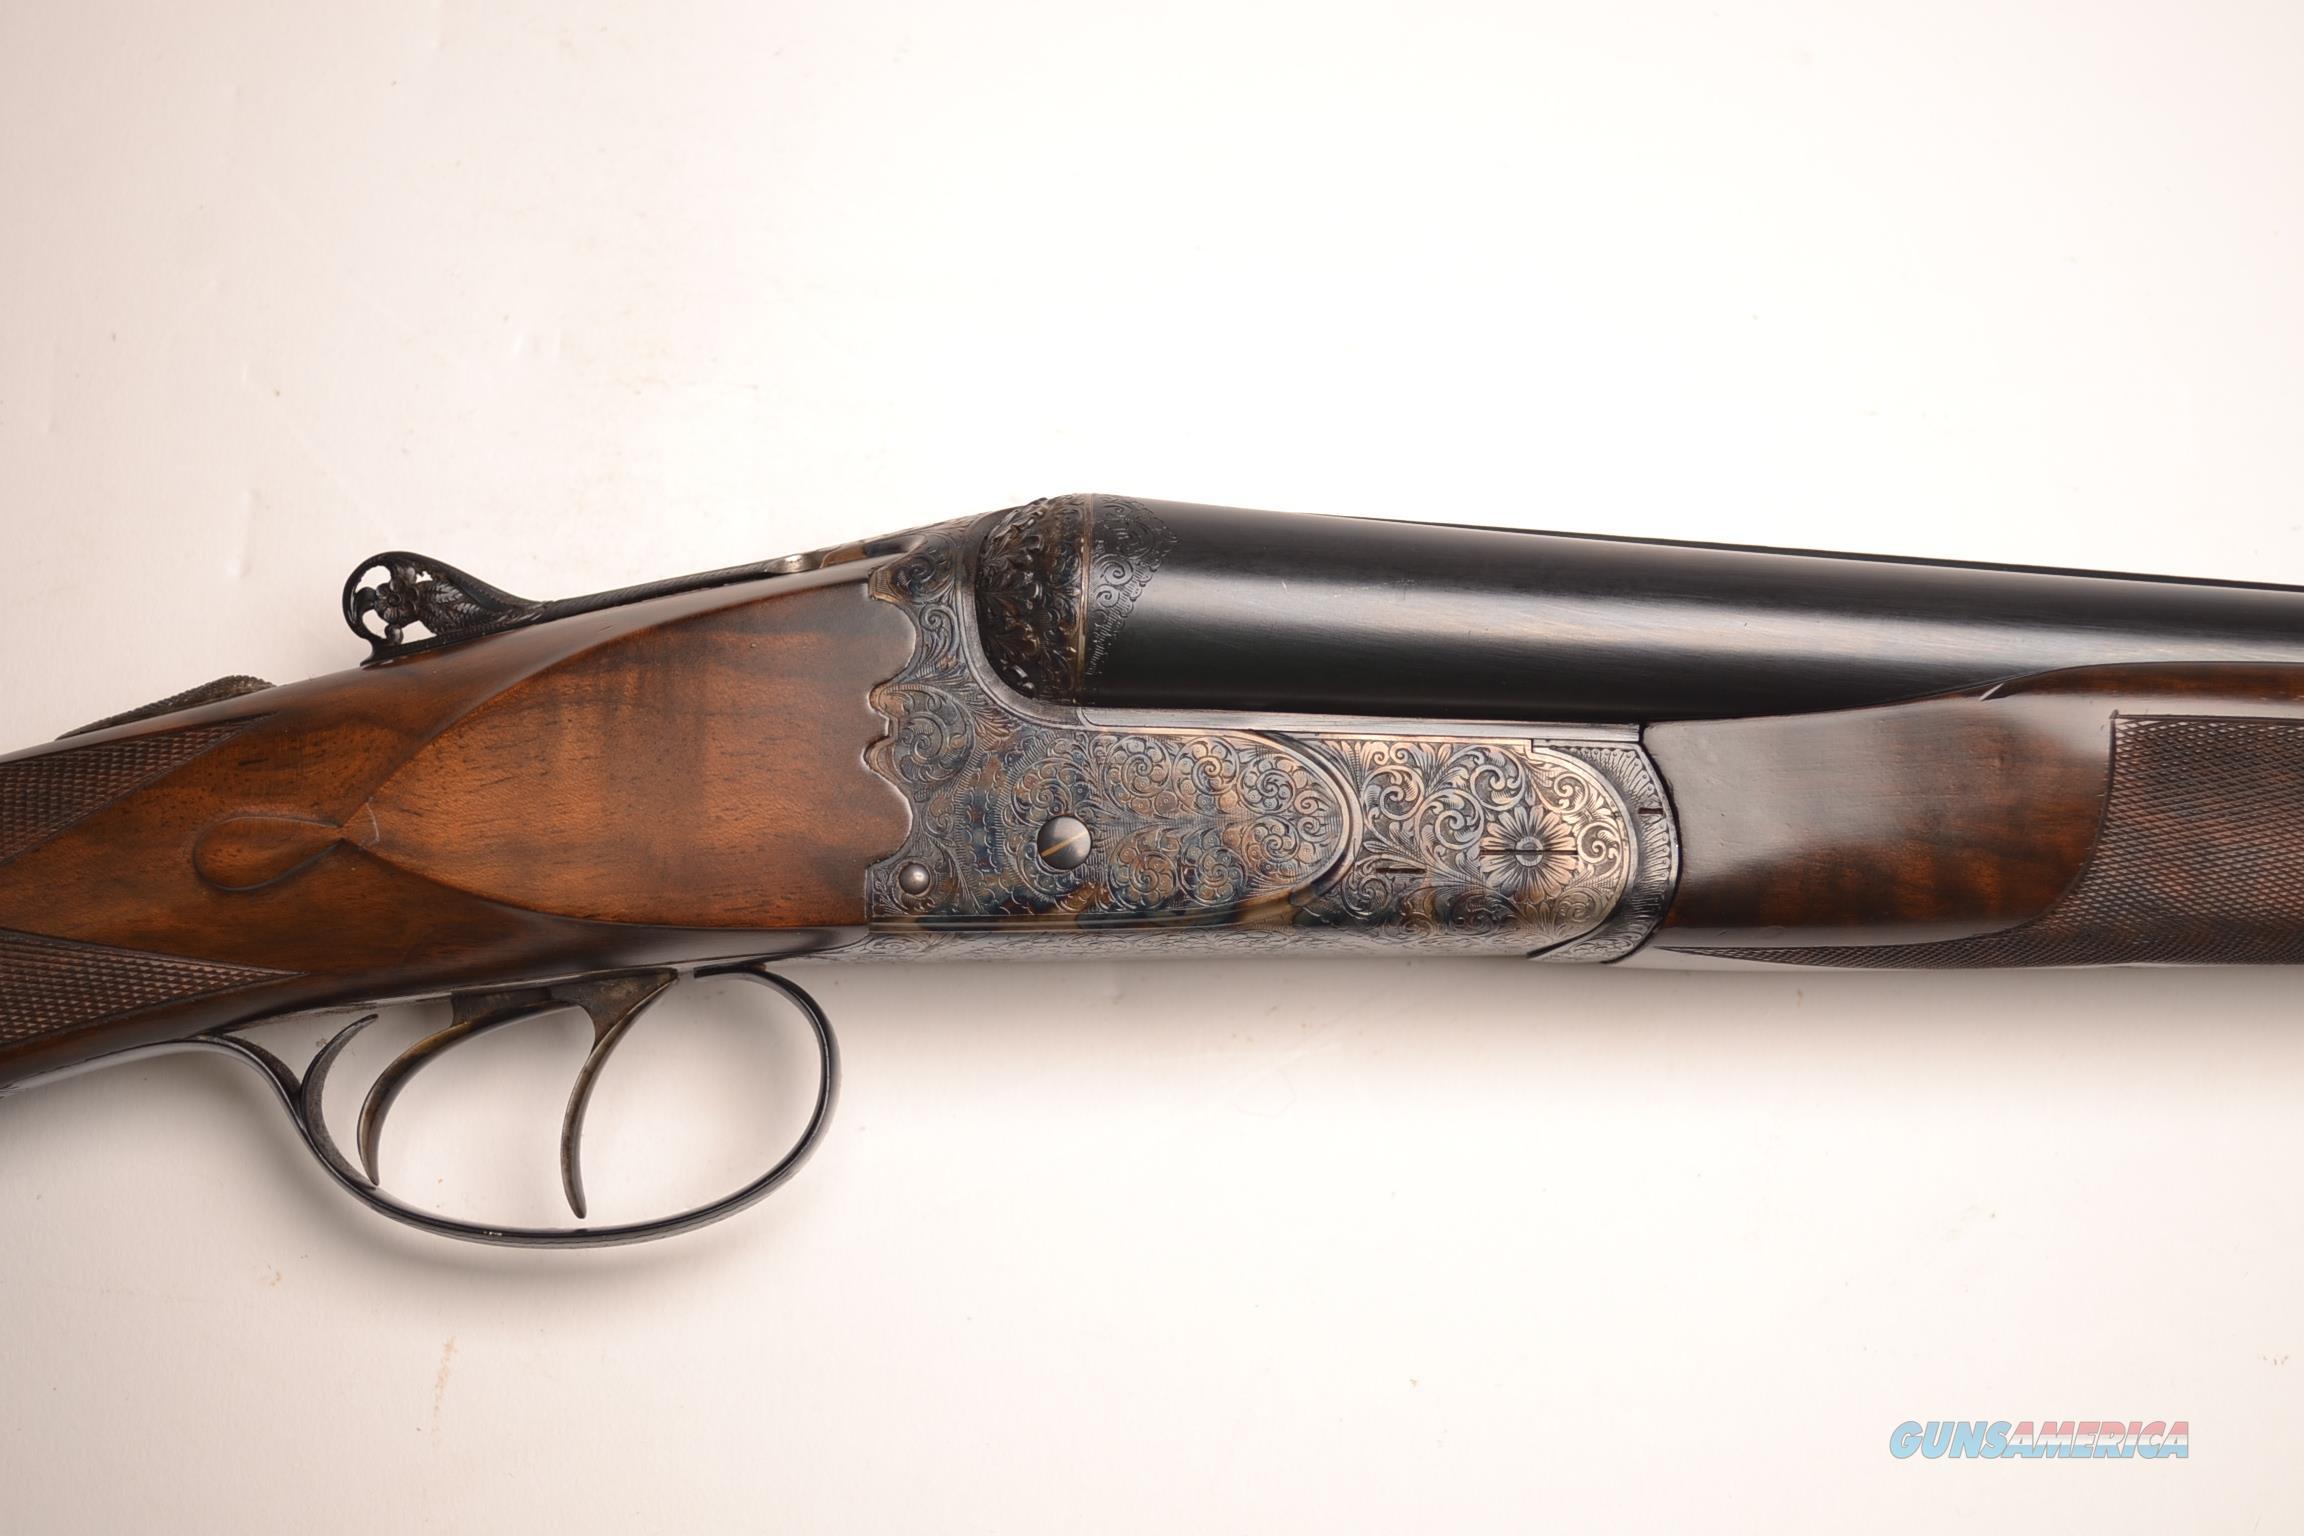 Abercrombie & Fitch - Extra Lusso  Guns > Shotguns > A Misc Shotguns